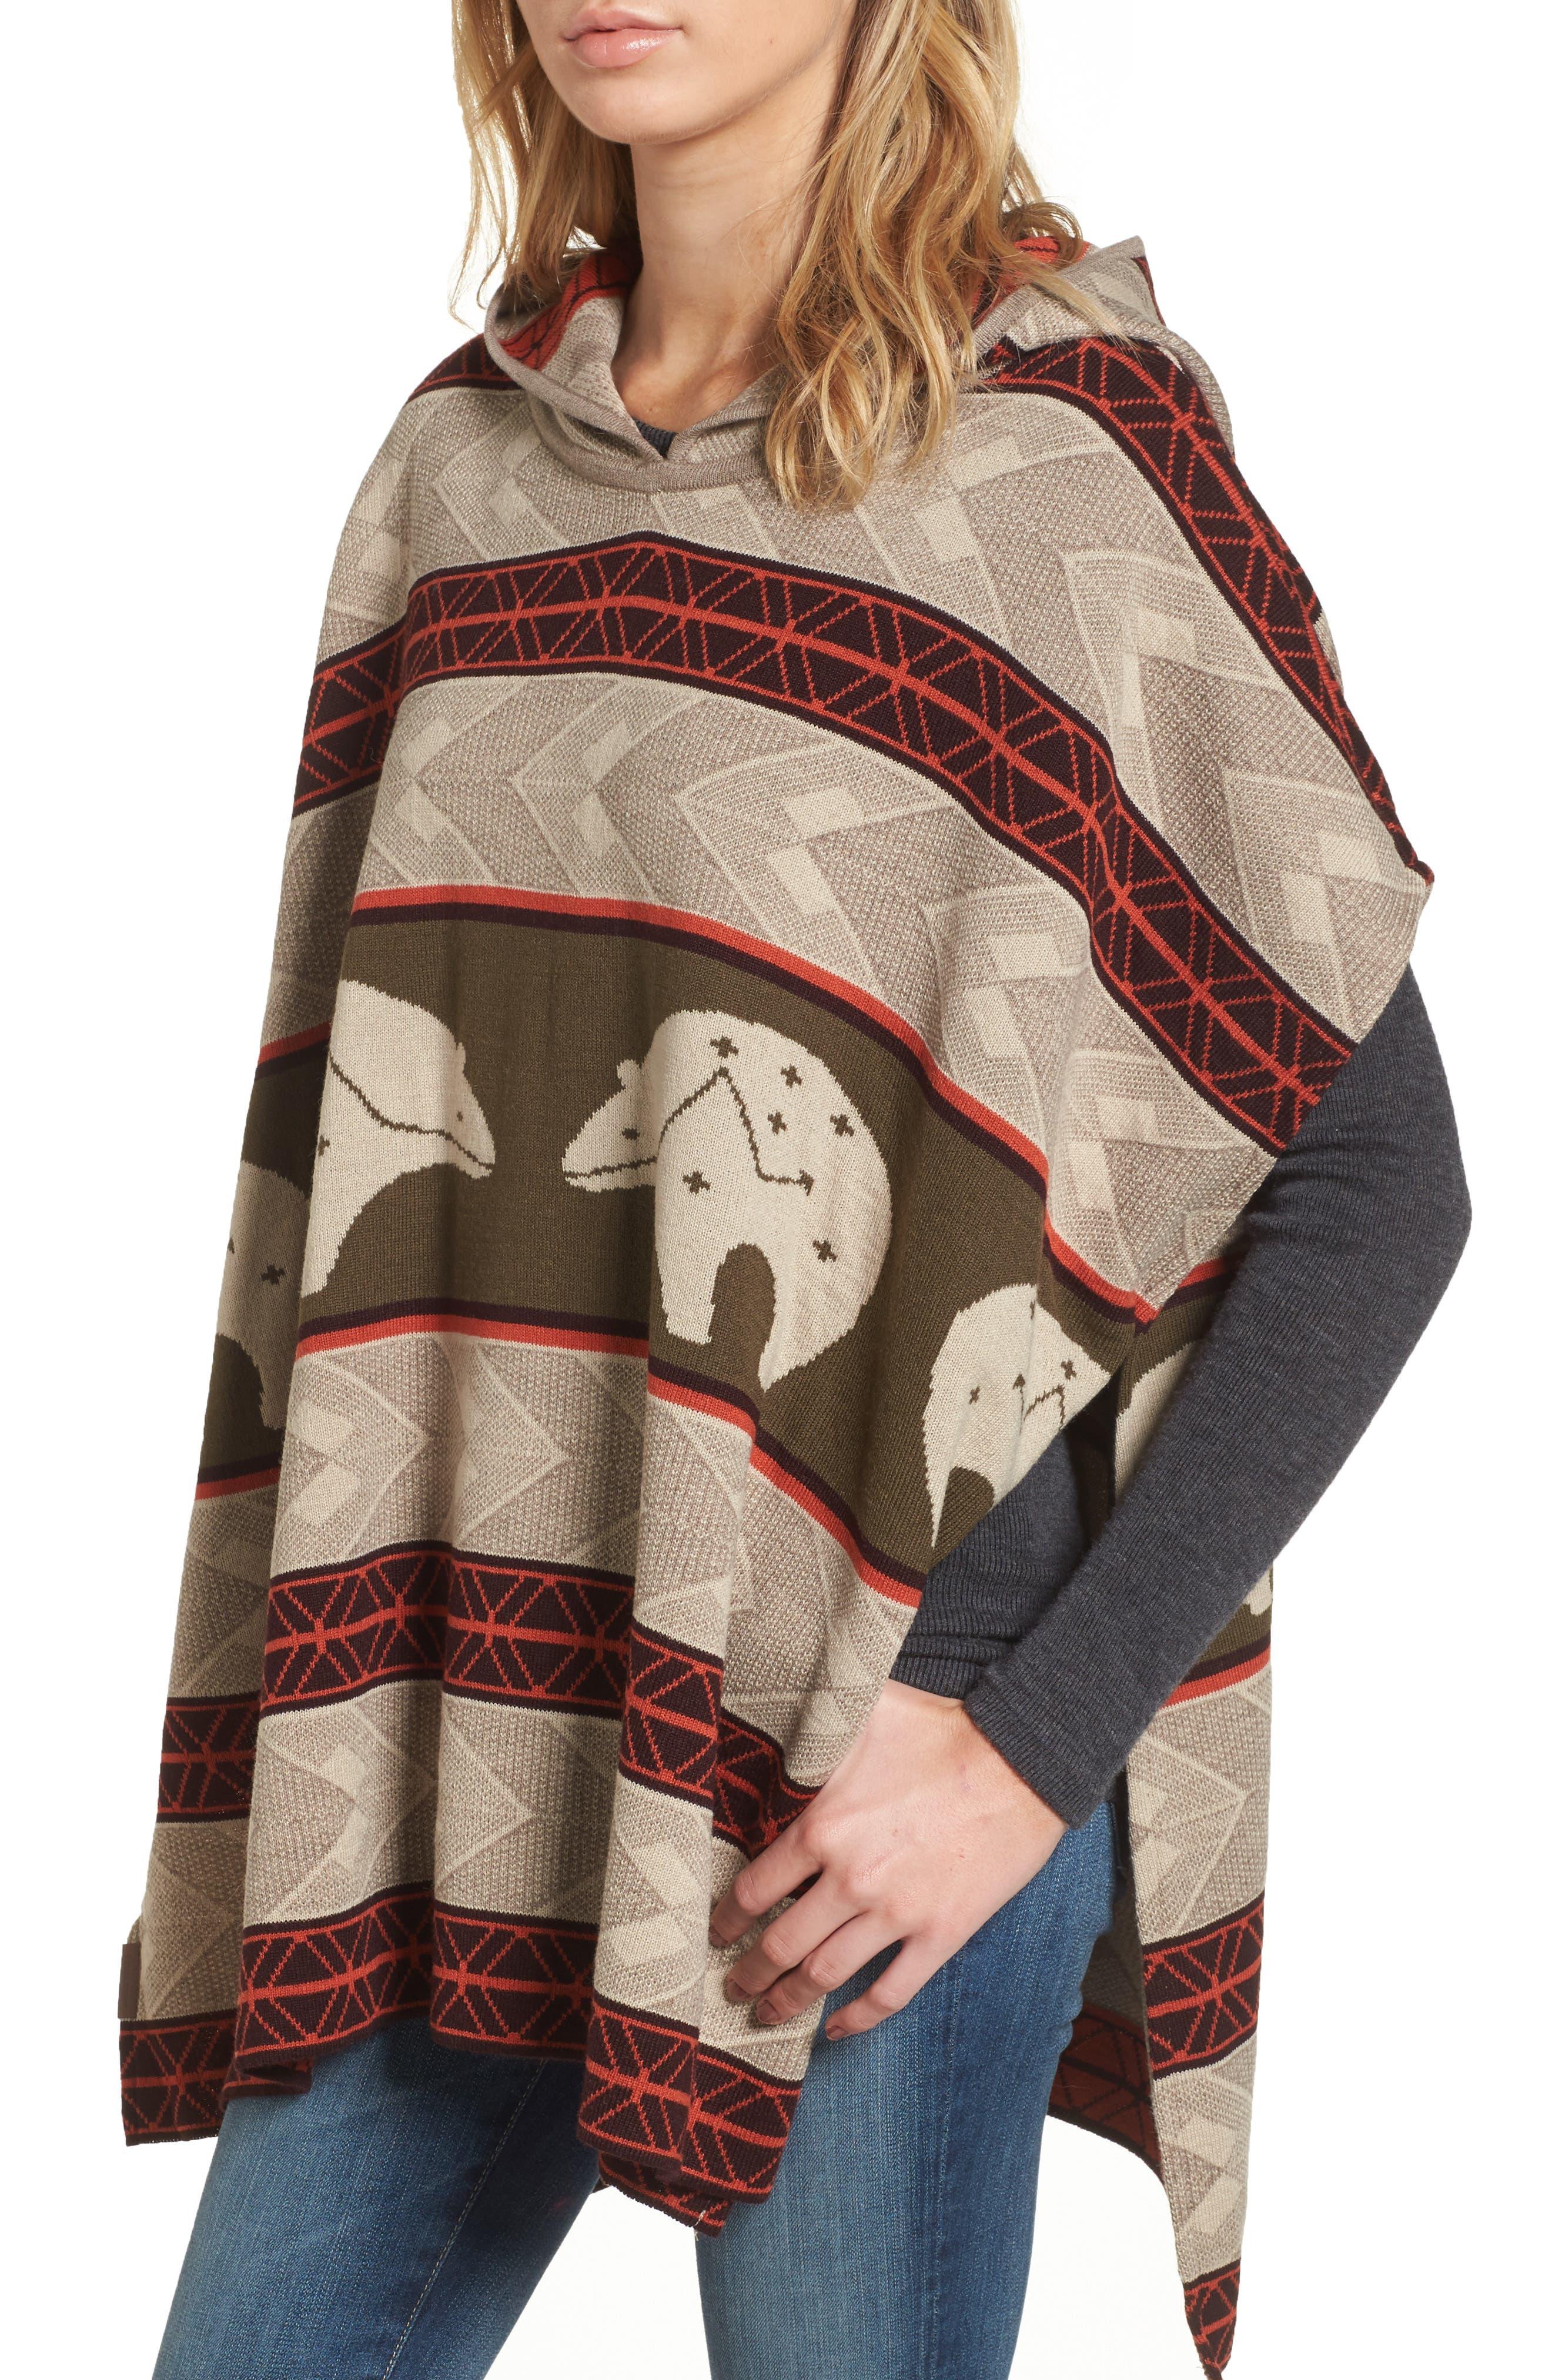 Alternate Image 1 Selected - Pendleton Knit Hooded Poncho